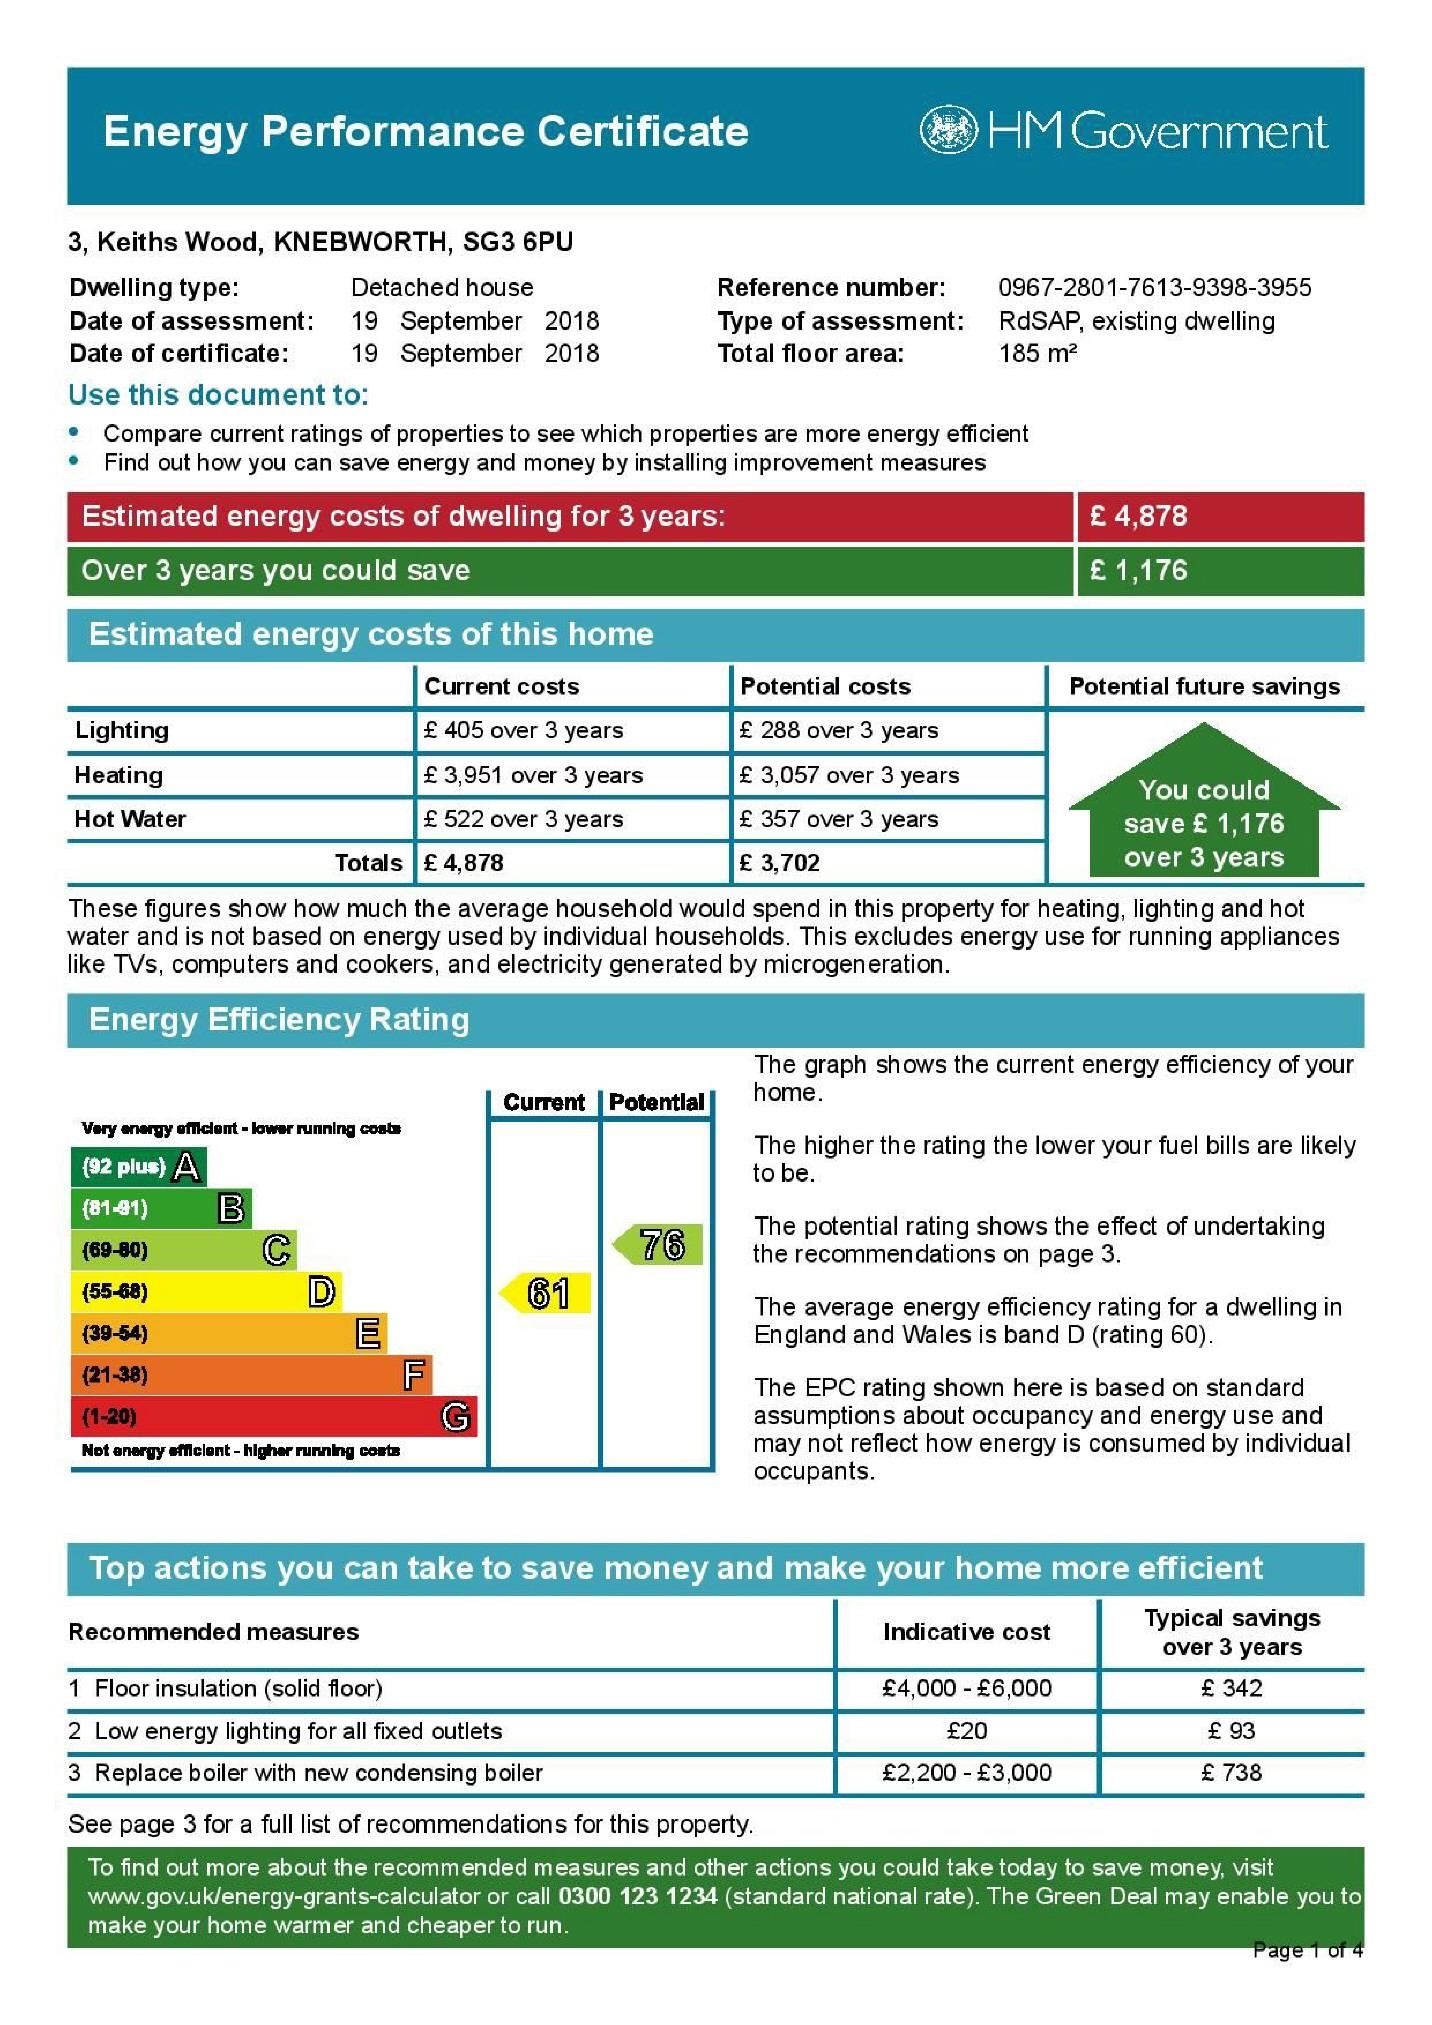 EPC Graph for Keiths Wood, Knebworth, SG3 6PU